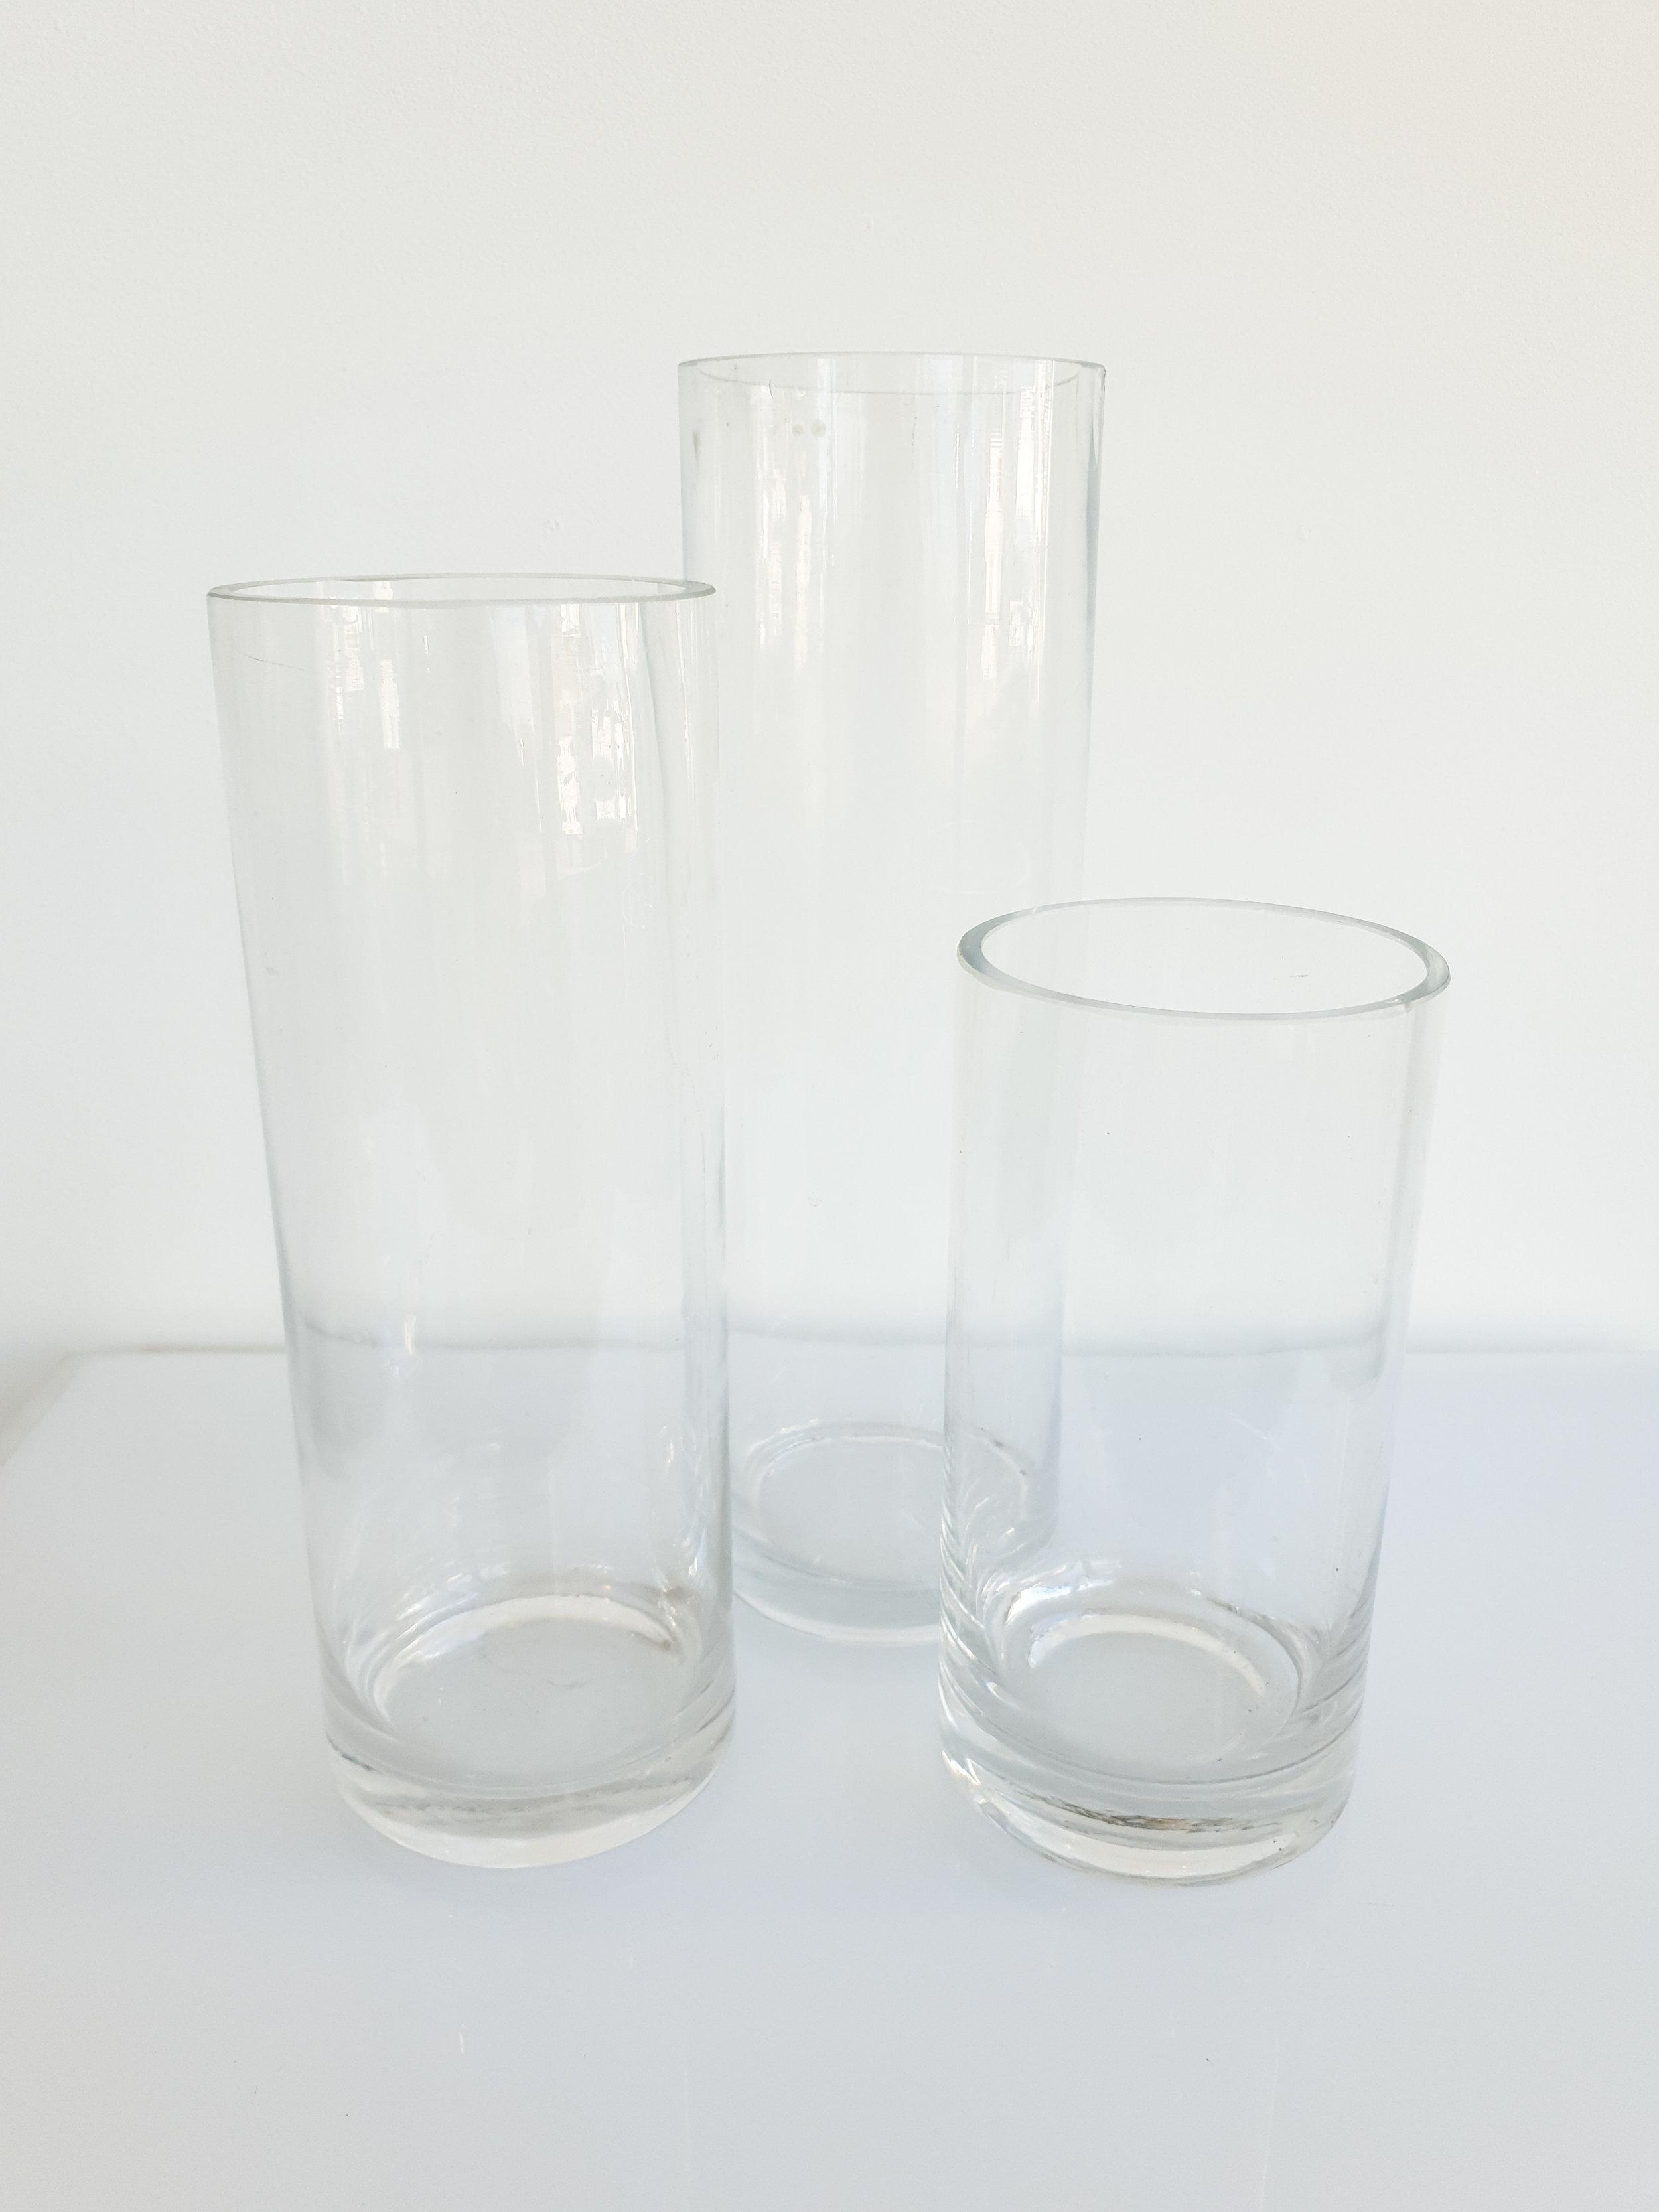 GLASS CYLINDER VASE  20 CM H $6+GST 25 CM H $6+GST 30 CM H $8+GST 40 CM H $10+GST 60 CM H $14+GST